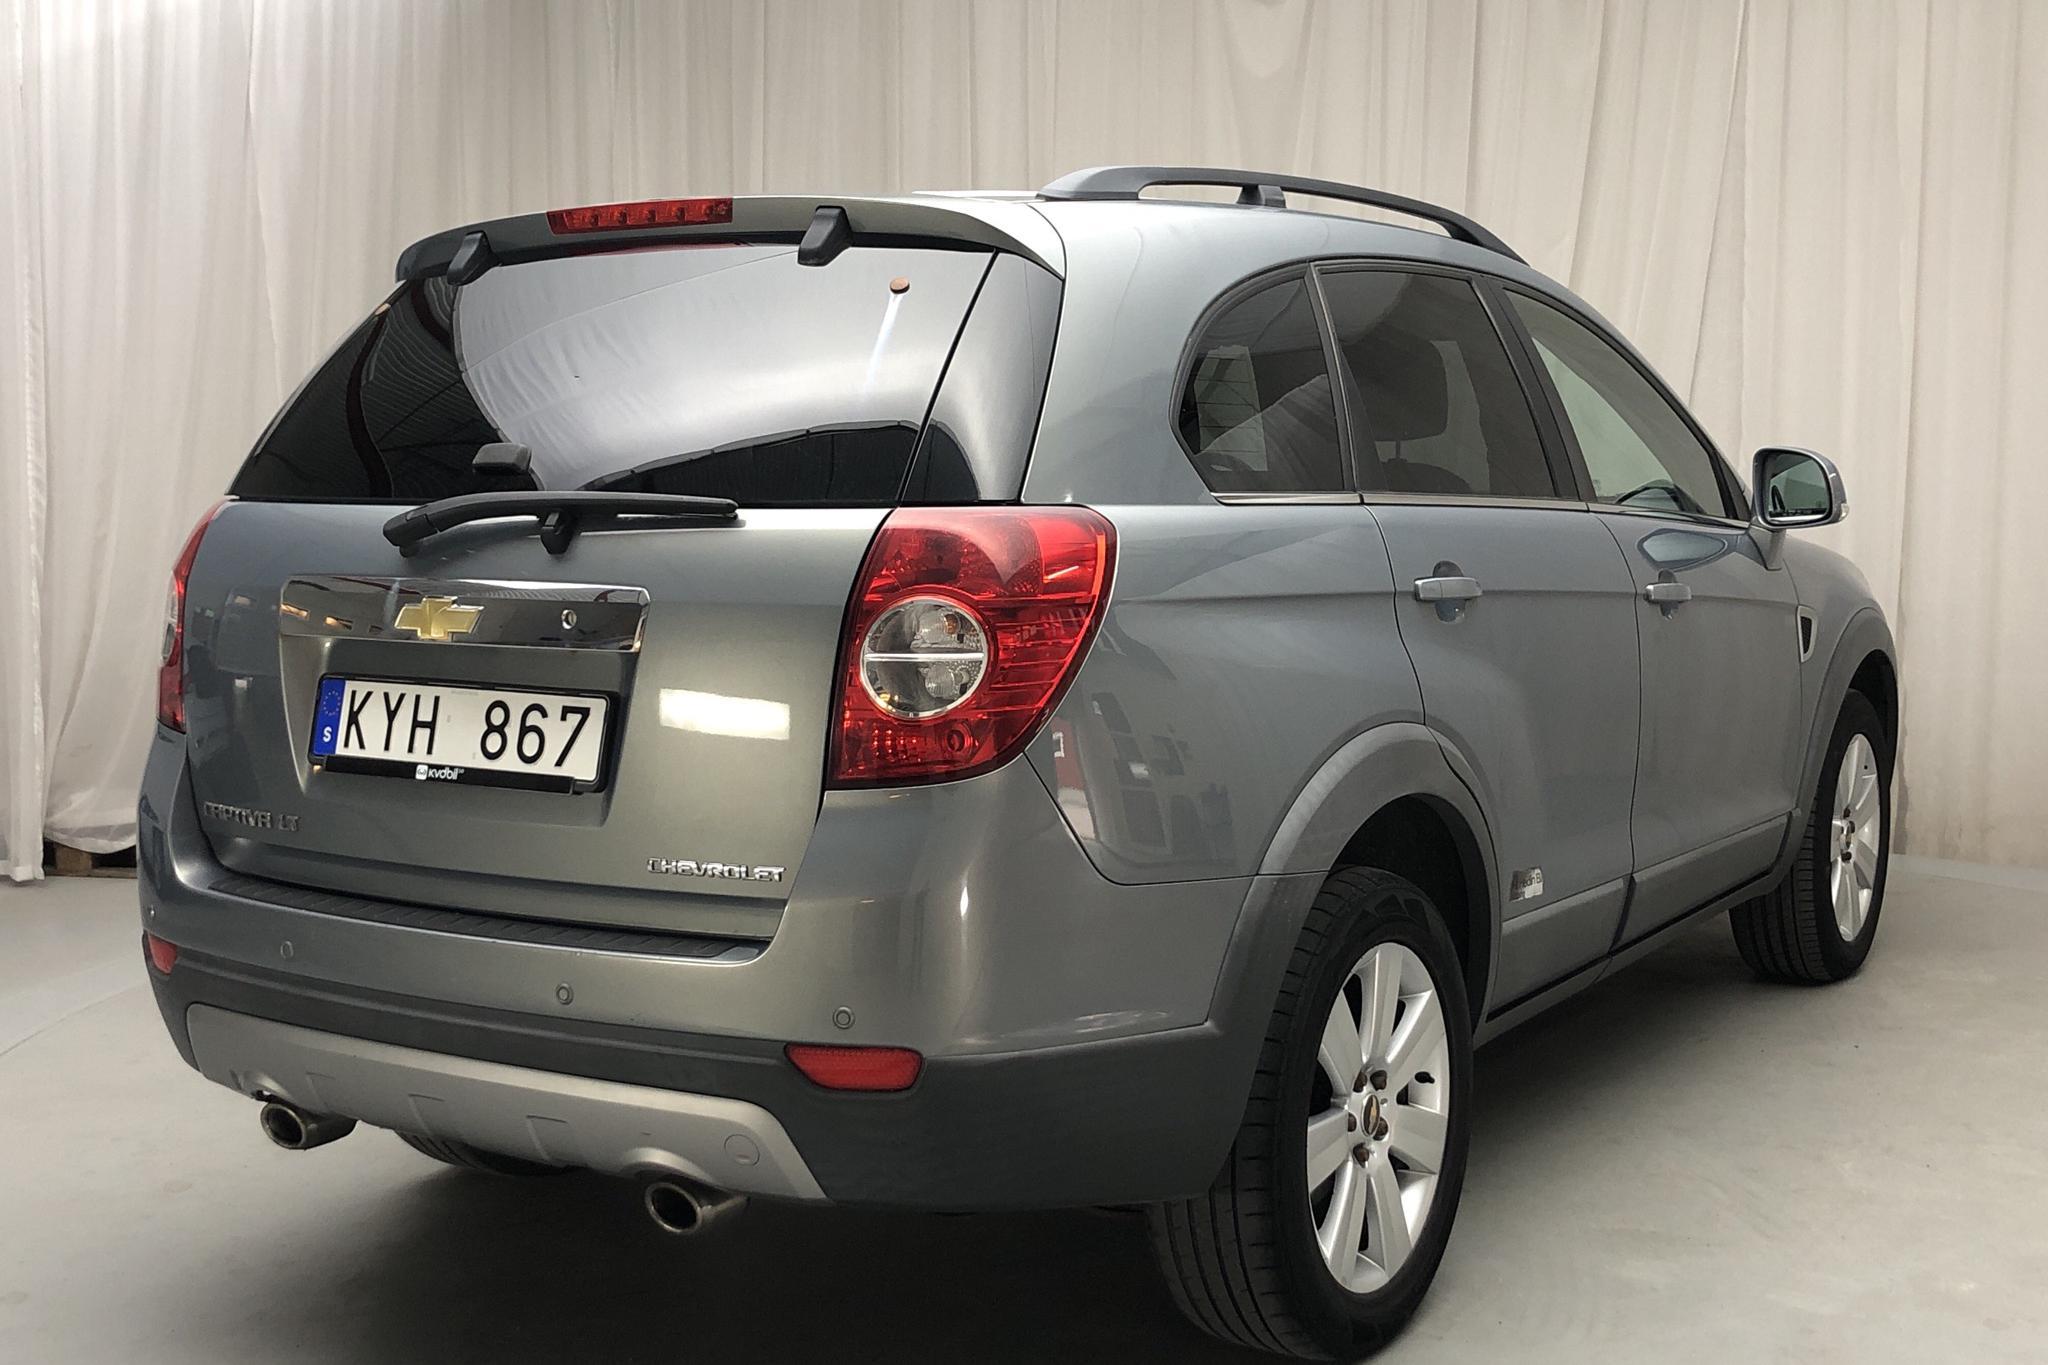 Chevrolet Captiva 2.0D 4WD (150hk) - 16 978 mil - Automat - grå - 2010